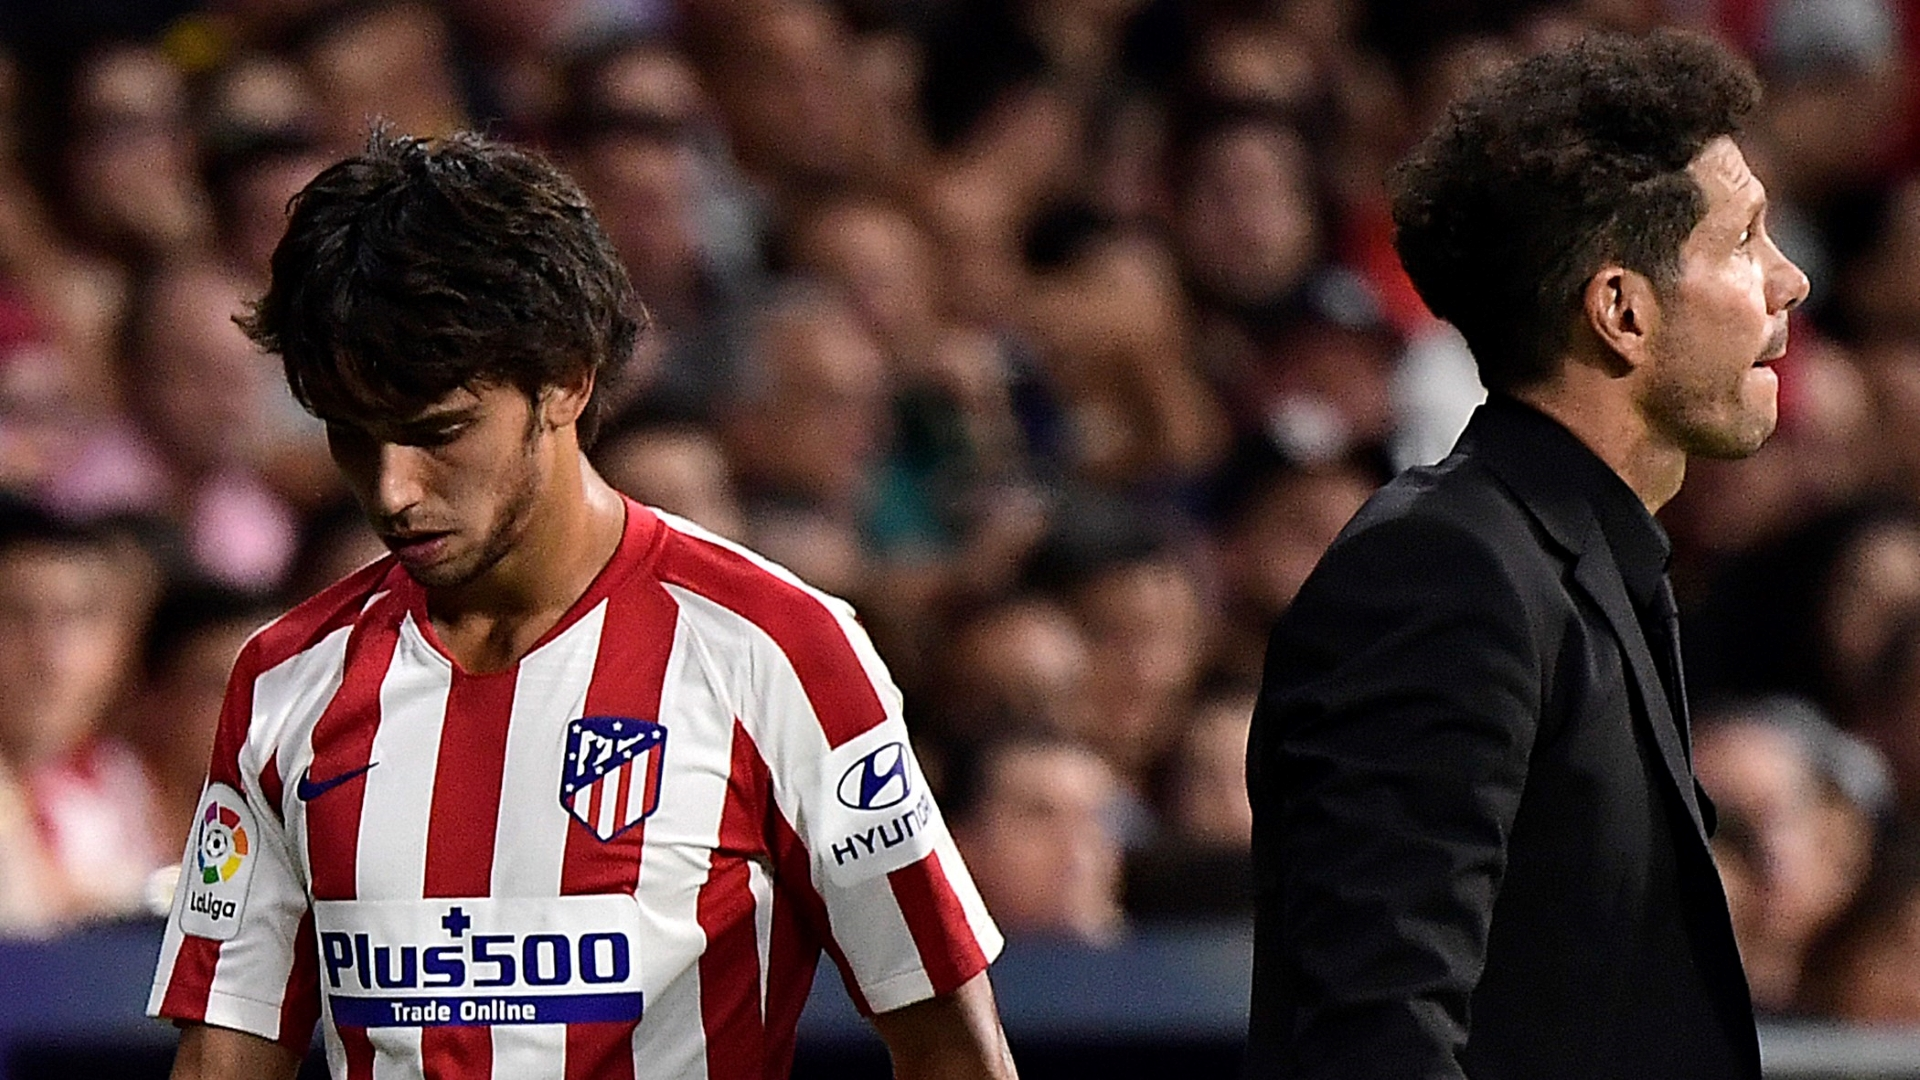 Joao Felix wants to grow like Griezmann under Simeone at Atletico